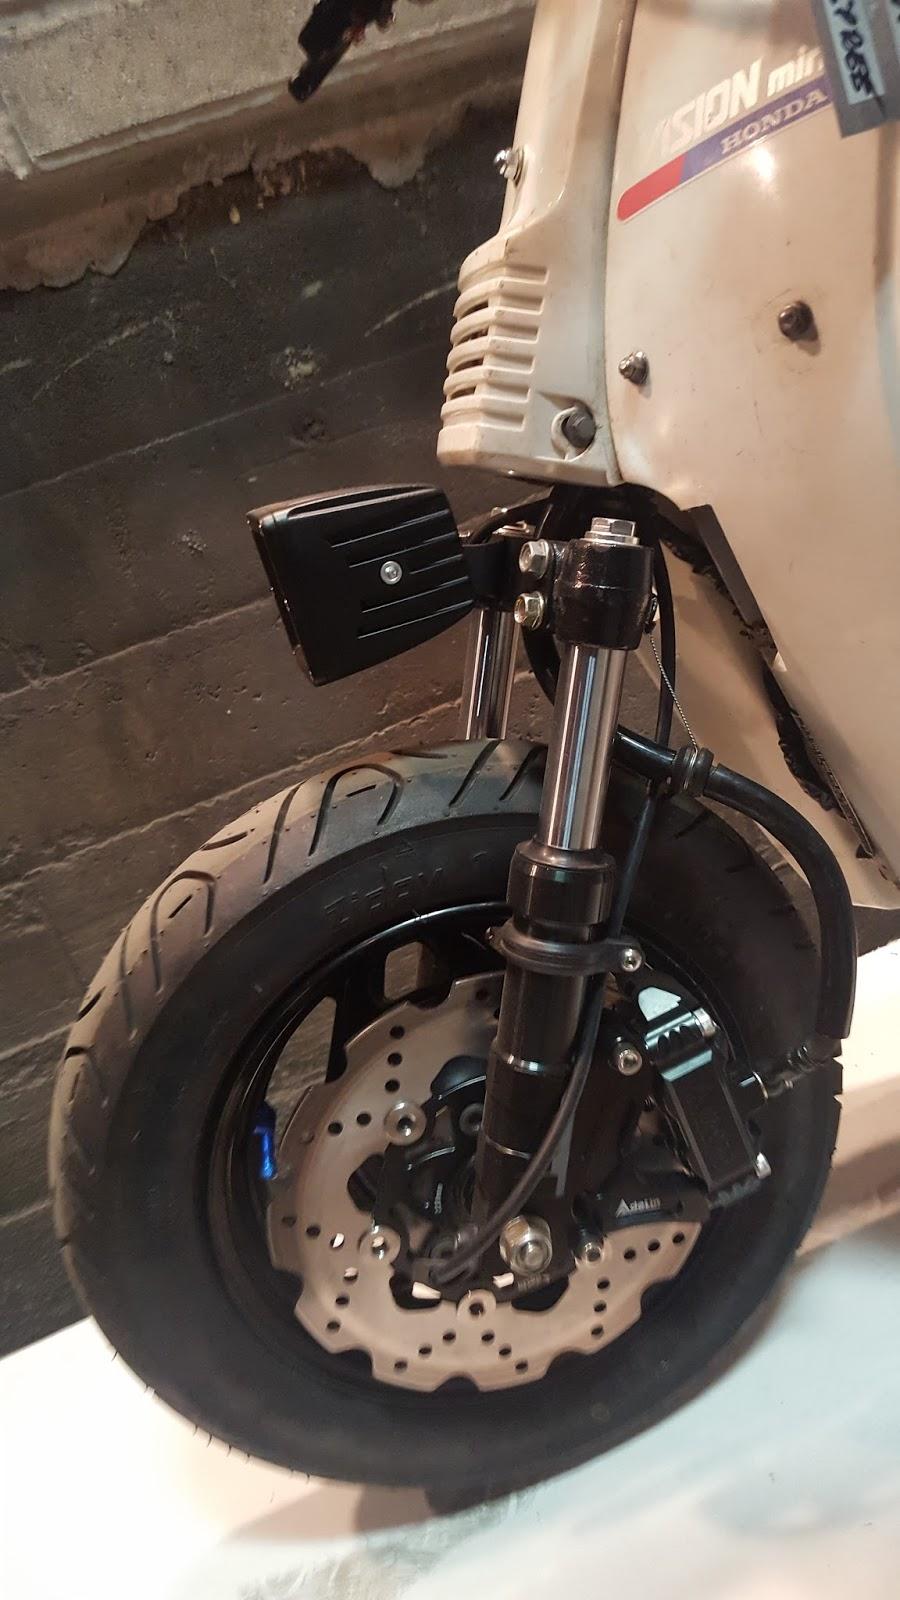 pipe run watch honda new straight spree speed parts